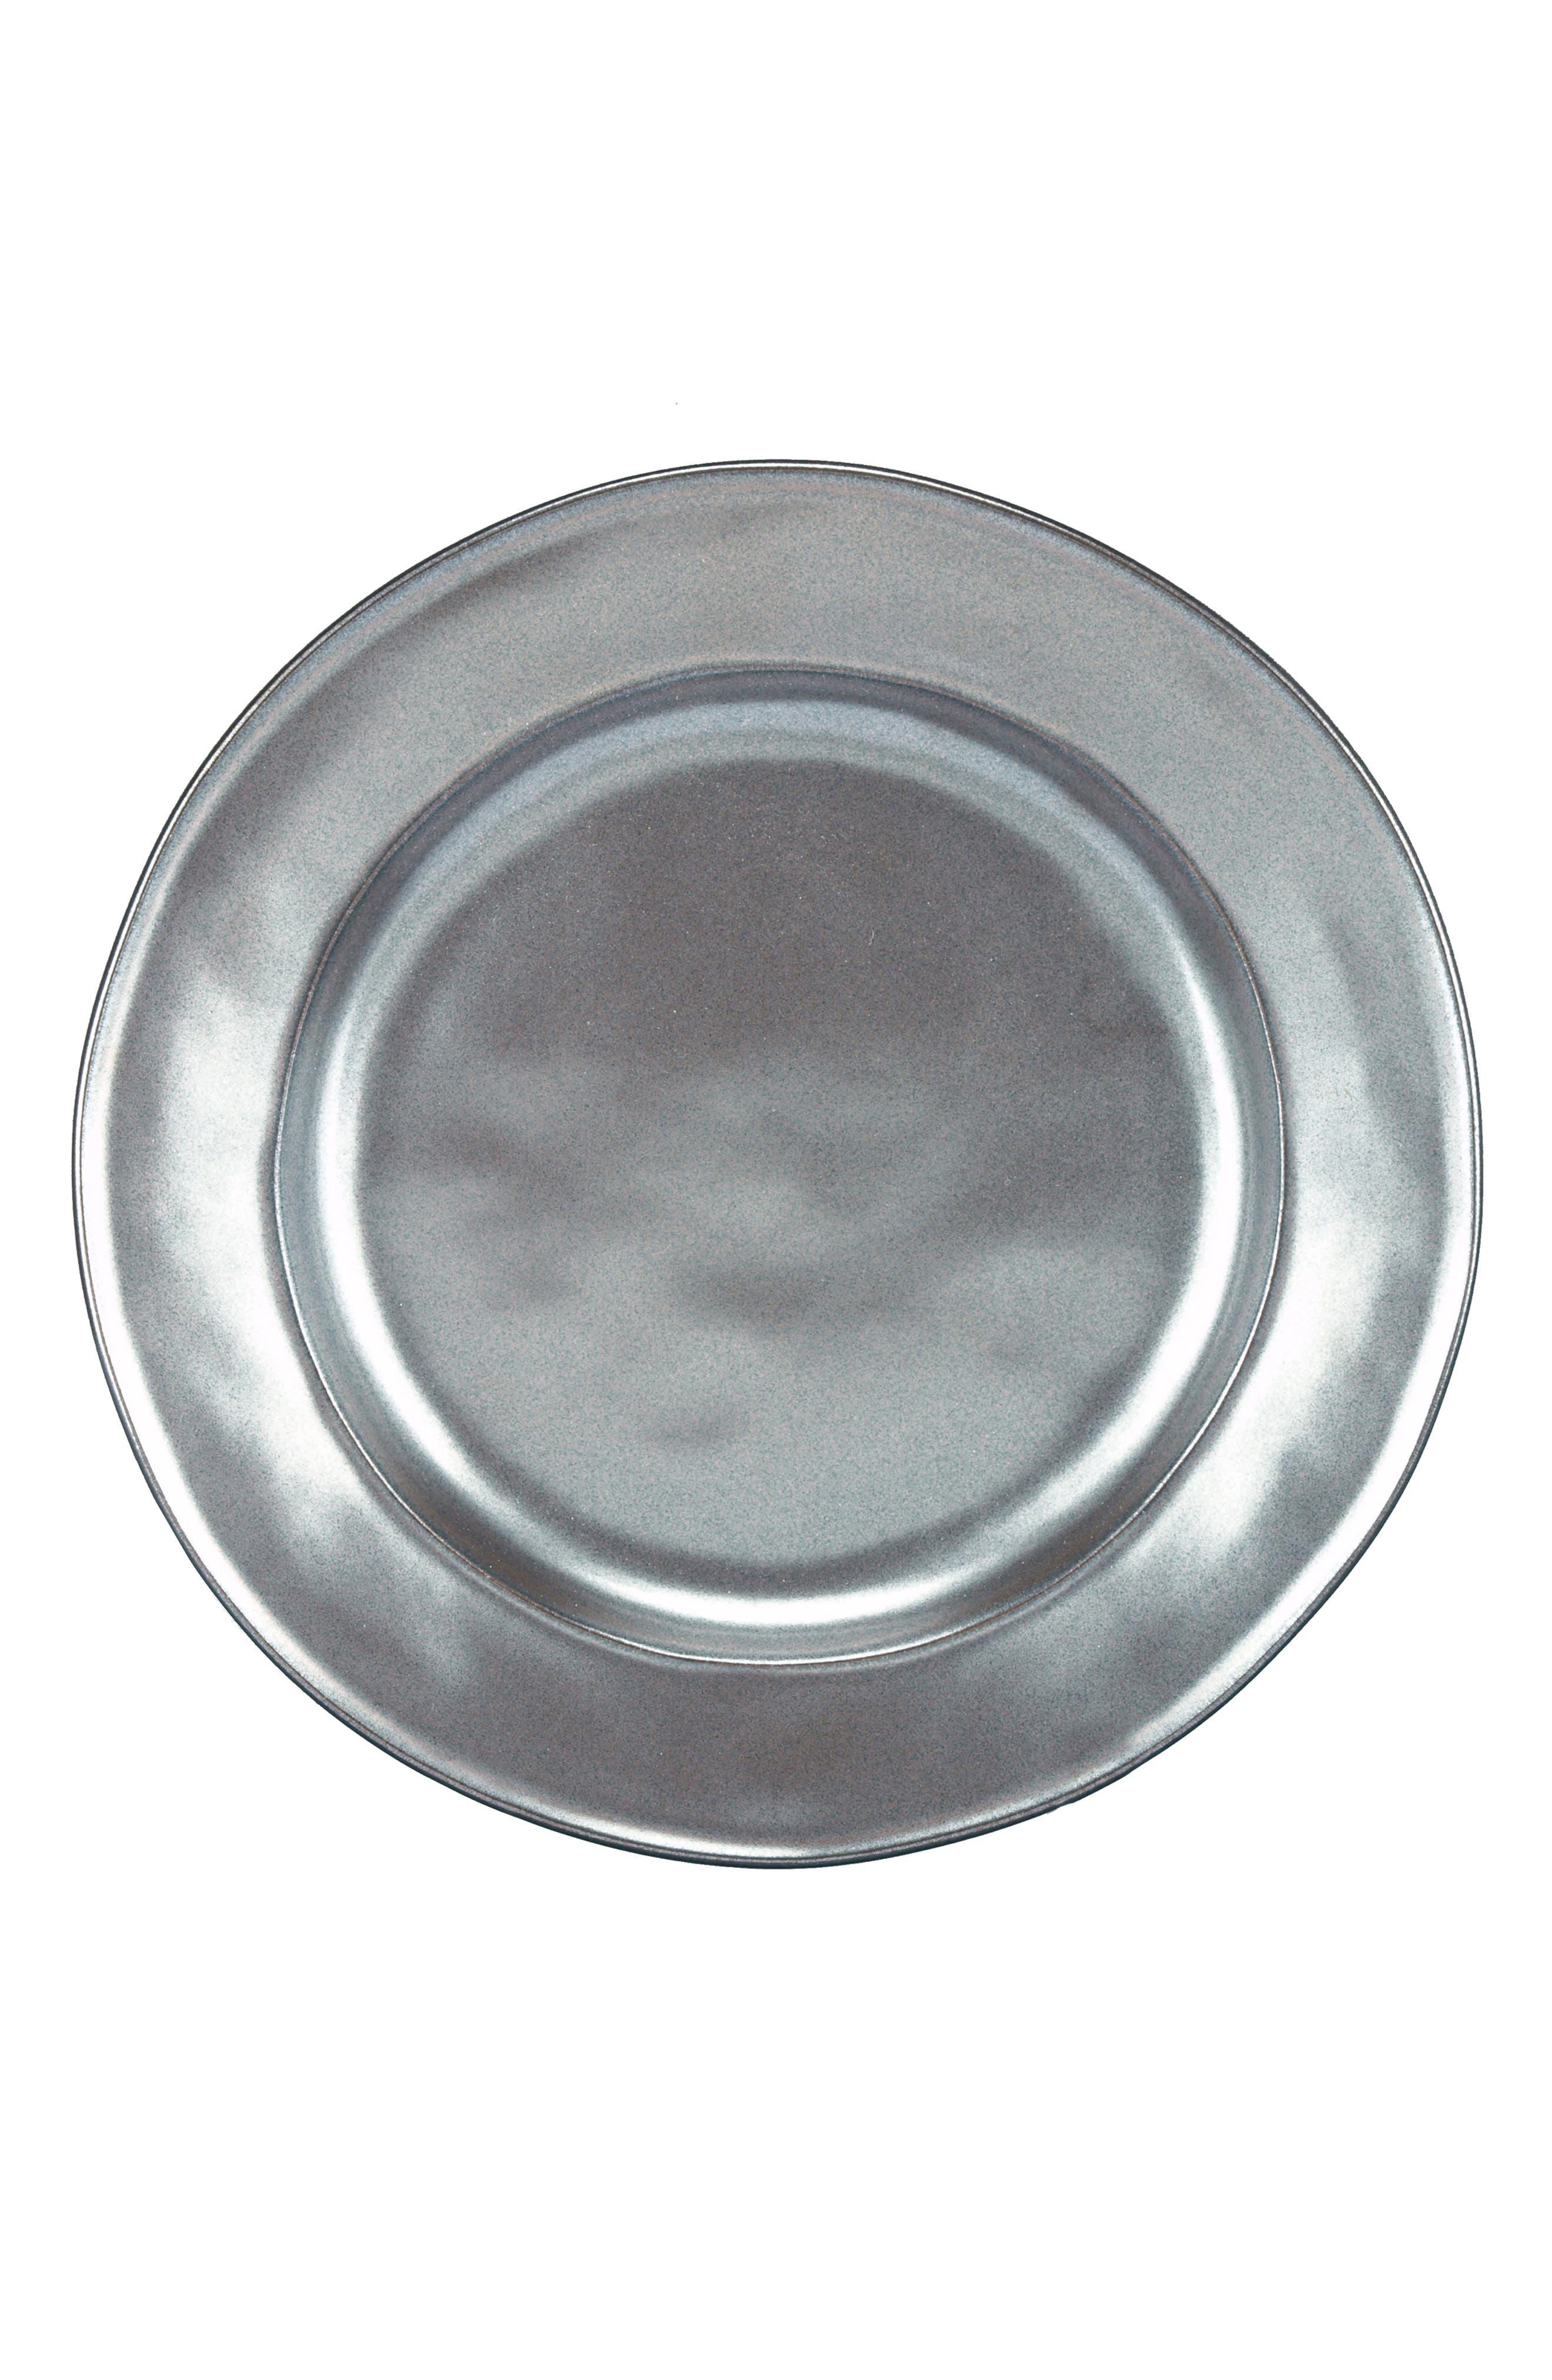 'Pewter' Ceramic Salad Plate,                             Alternate thumbnail 2, color,                             PEWTER